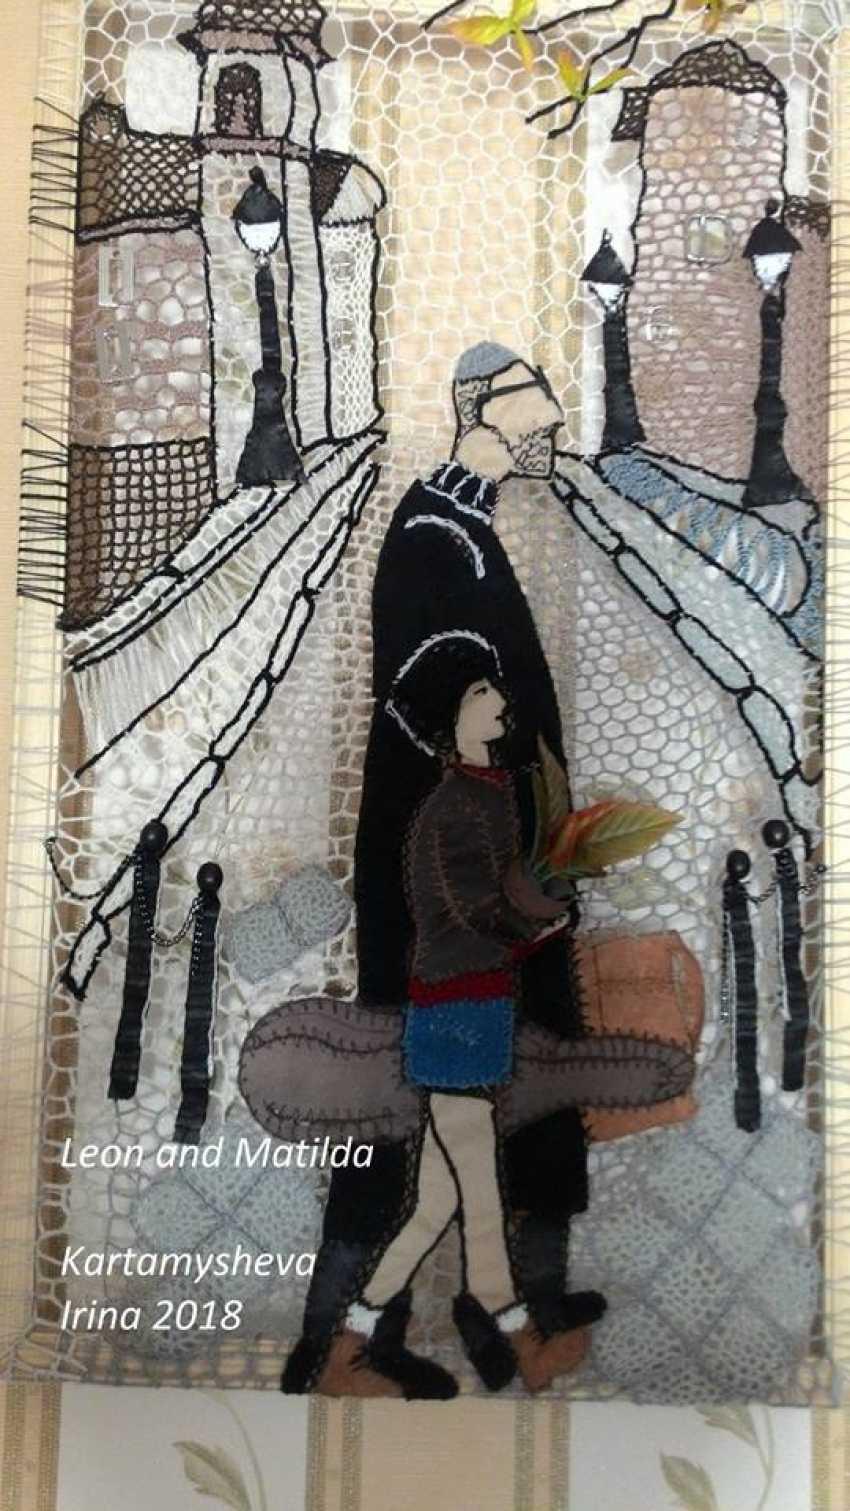 Irina Kartamysheva. Leon and Matilda - photo 1